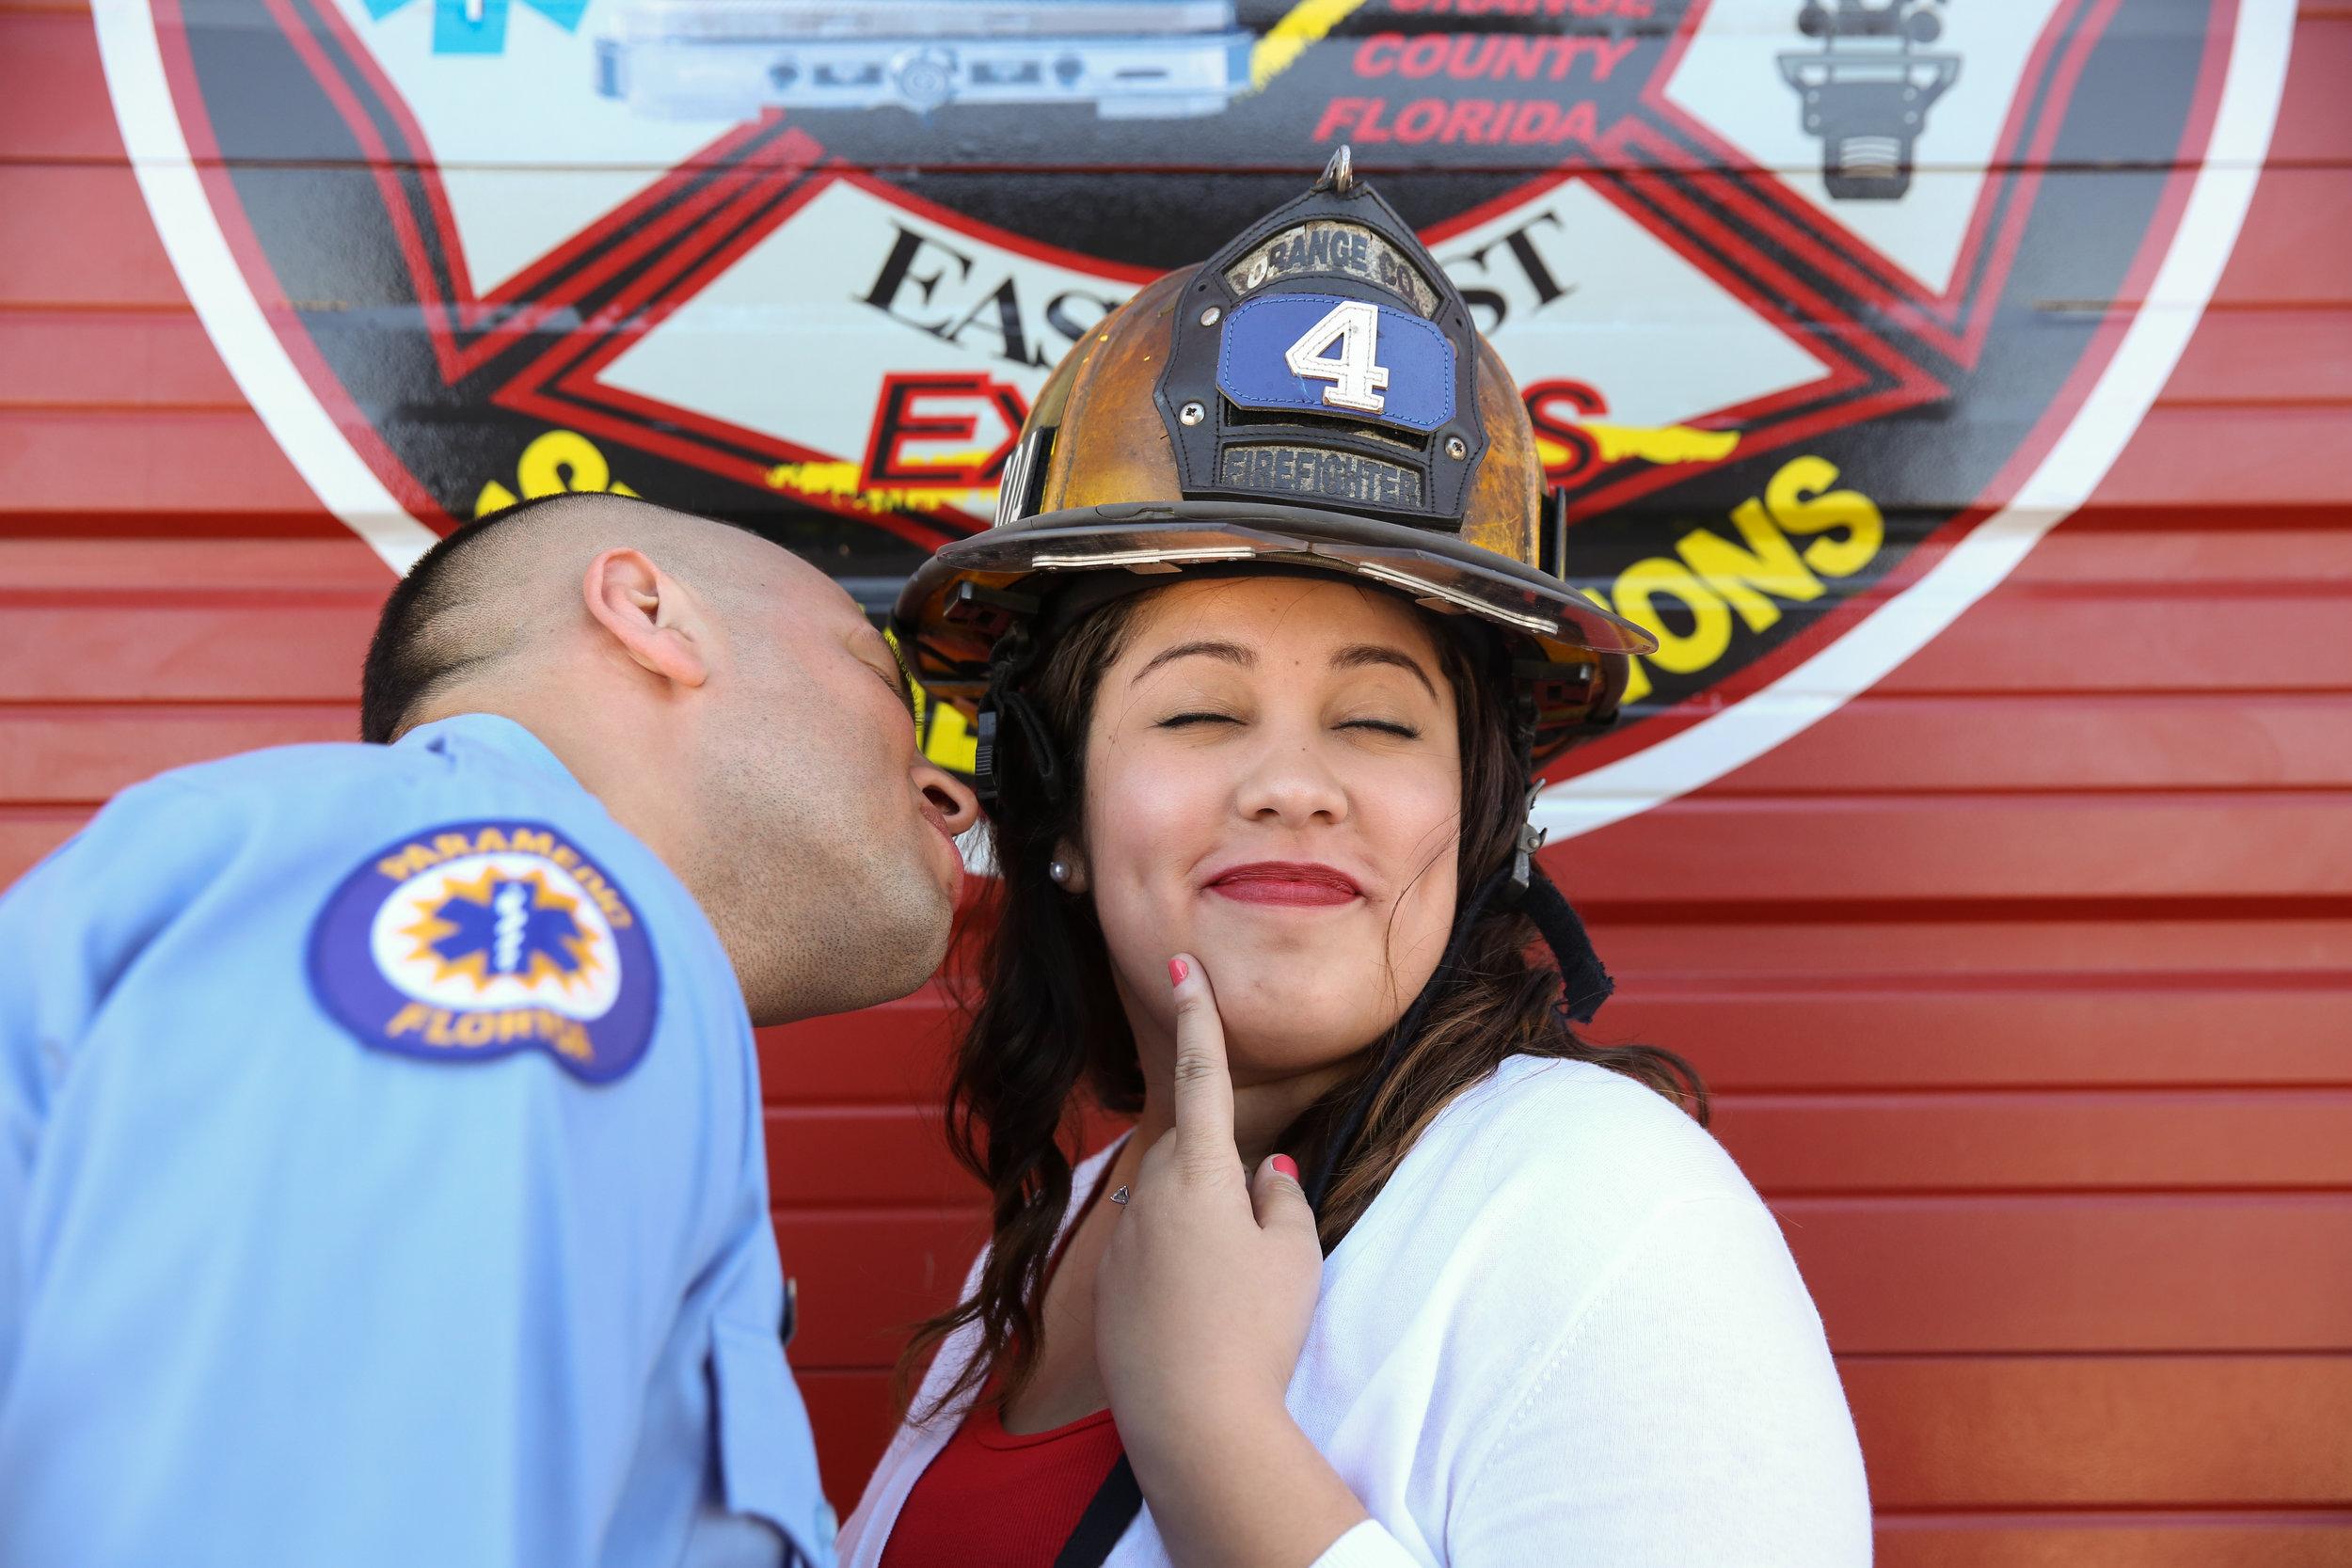 orlando-wedding-photographer-engagement-session-photography-firefighter..jpg